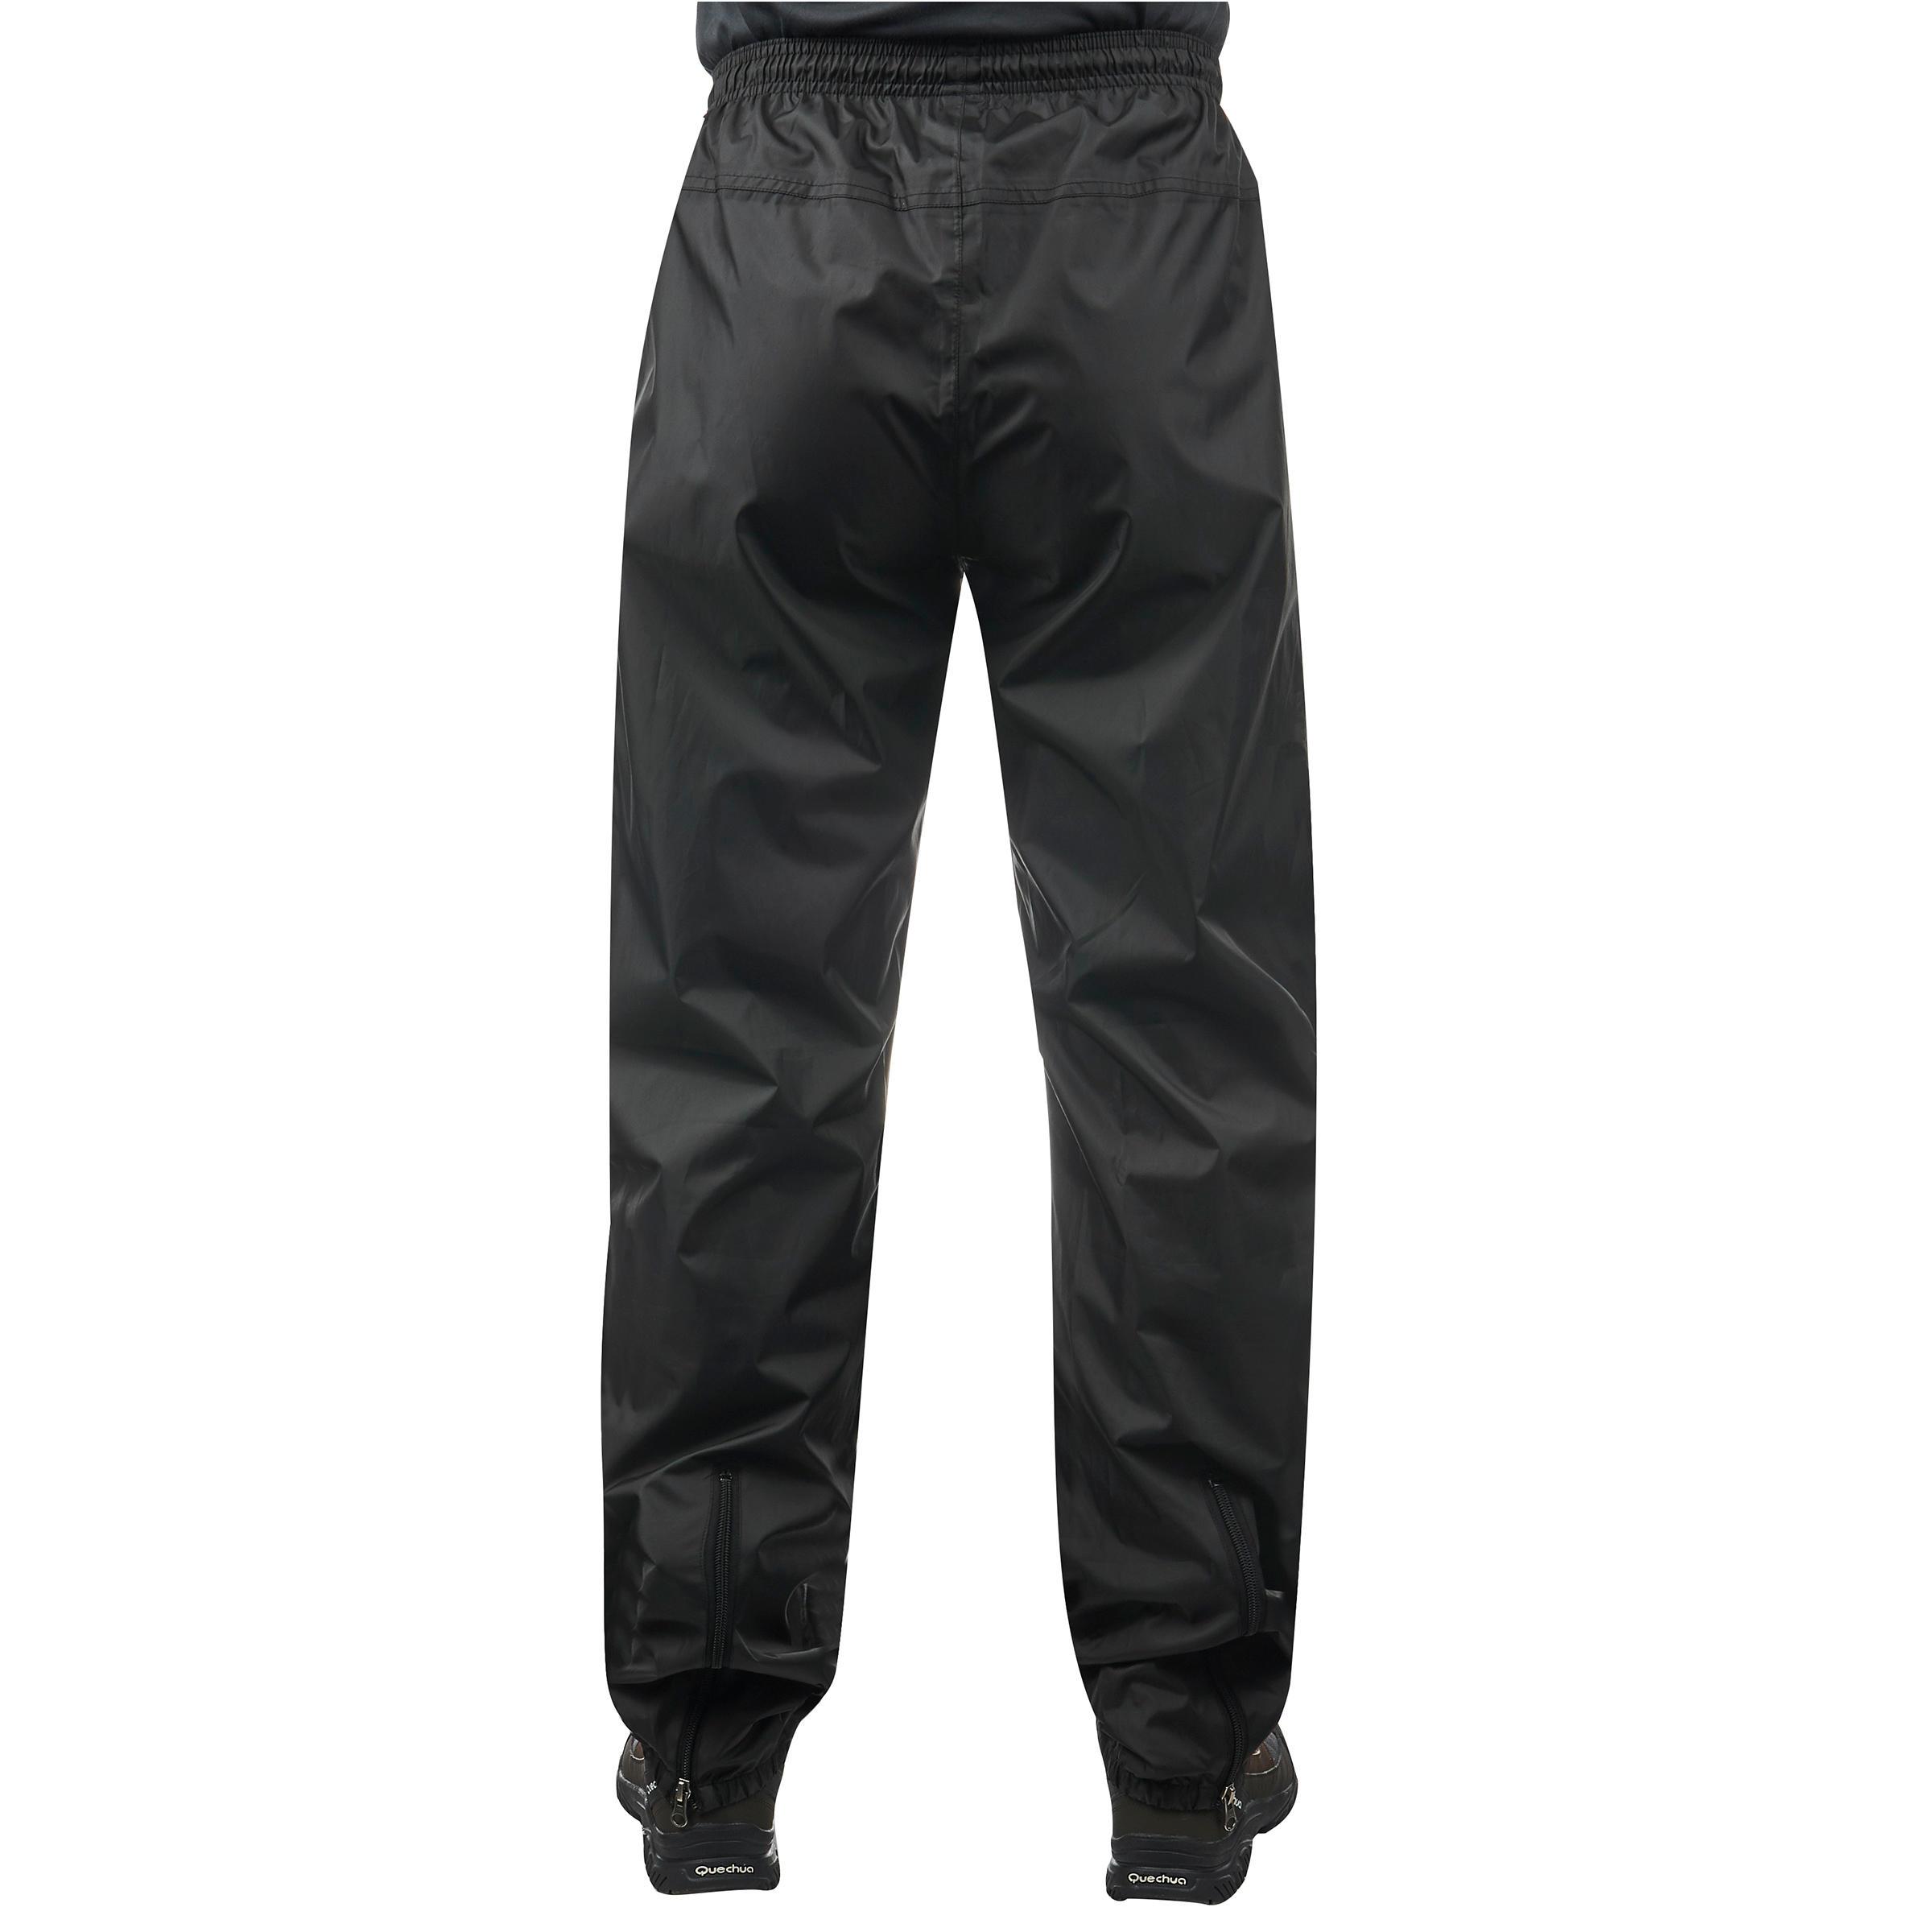 Mens Cargo Motorbike Protective Trousers Waterproof Black W36 L34